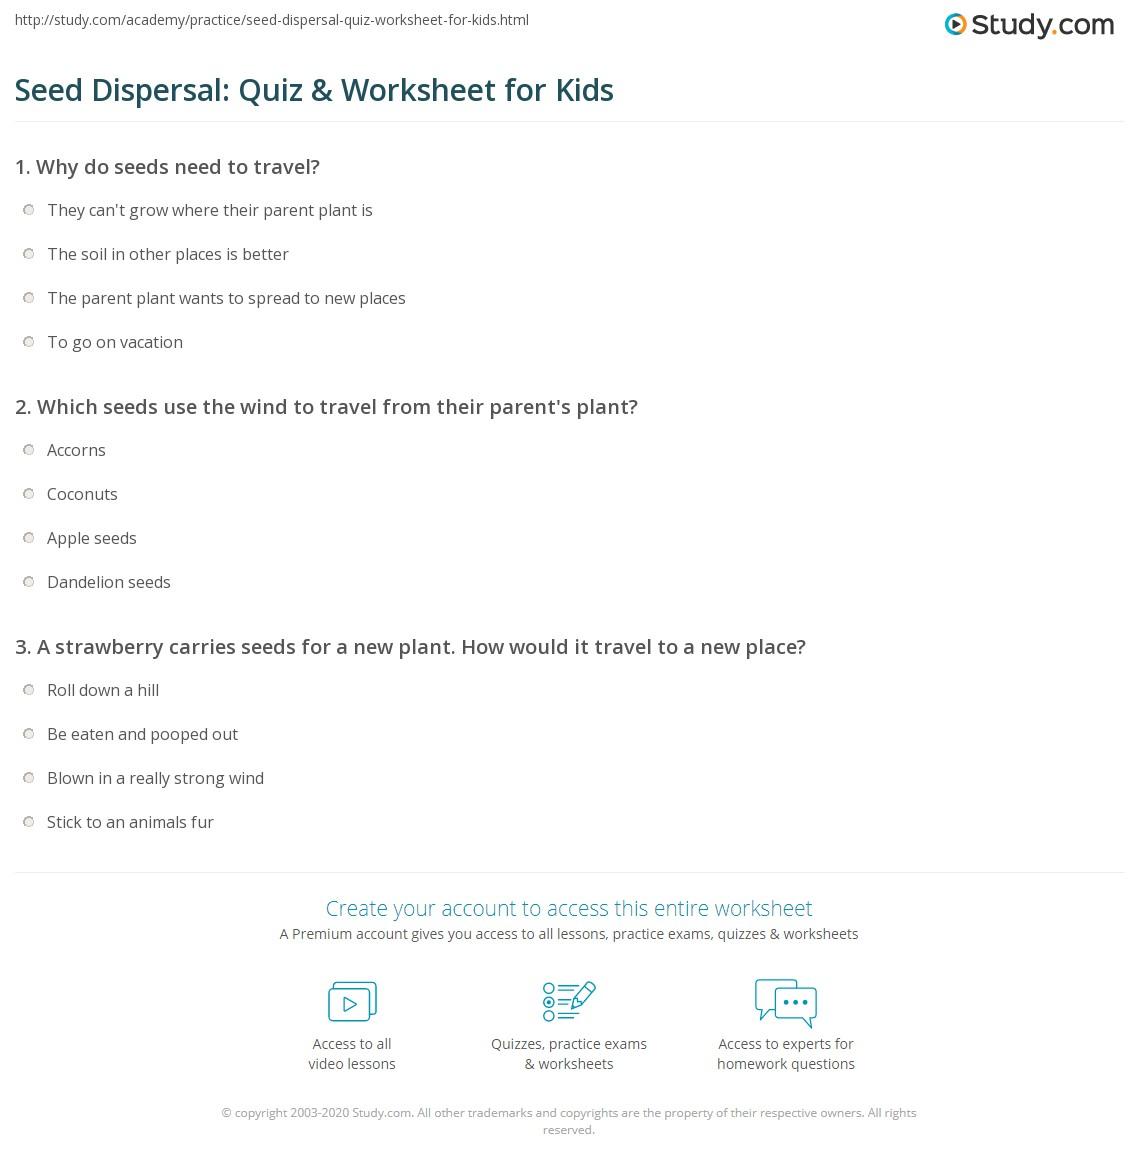 worksheet Seed Dispersal Ks2 Worksheet seed dispersal quiz worksheet for kids study com print lesson facts methods worksheet